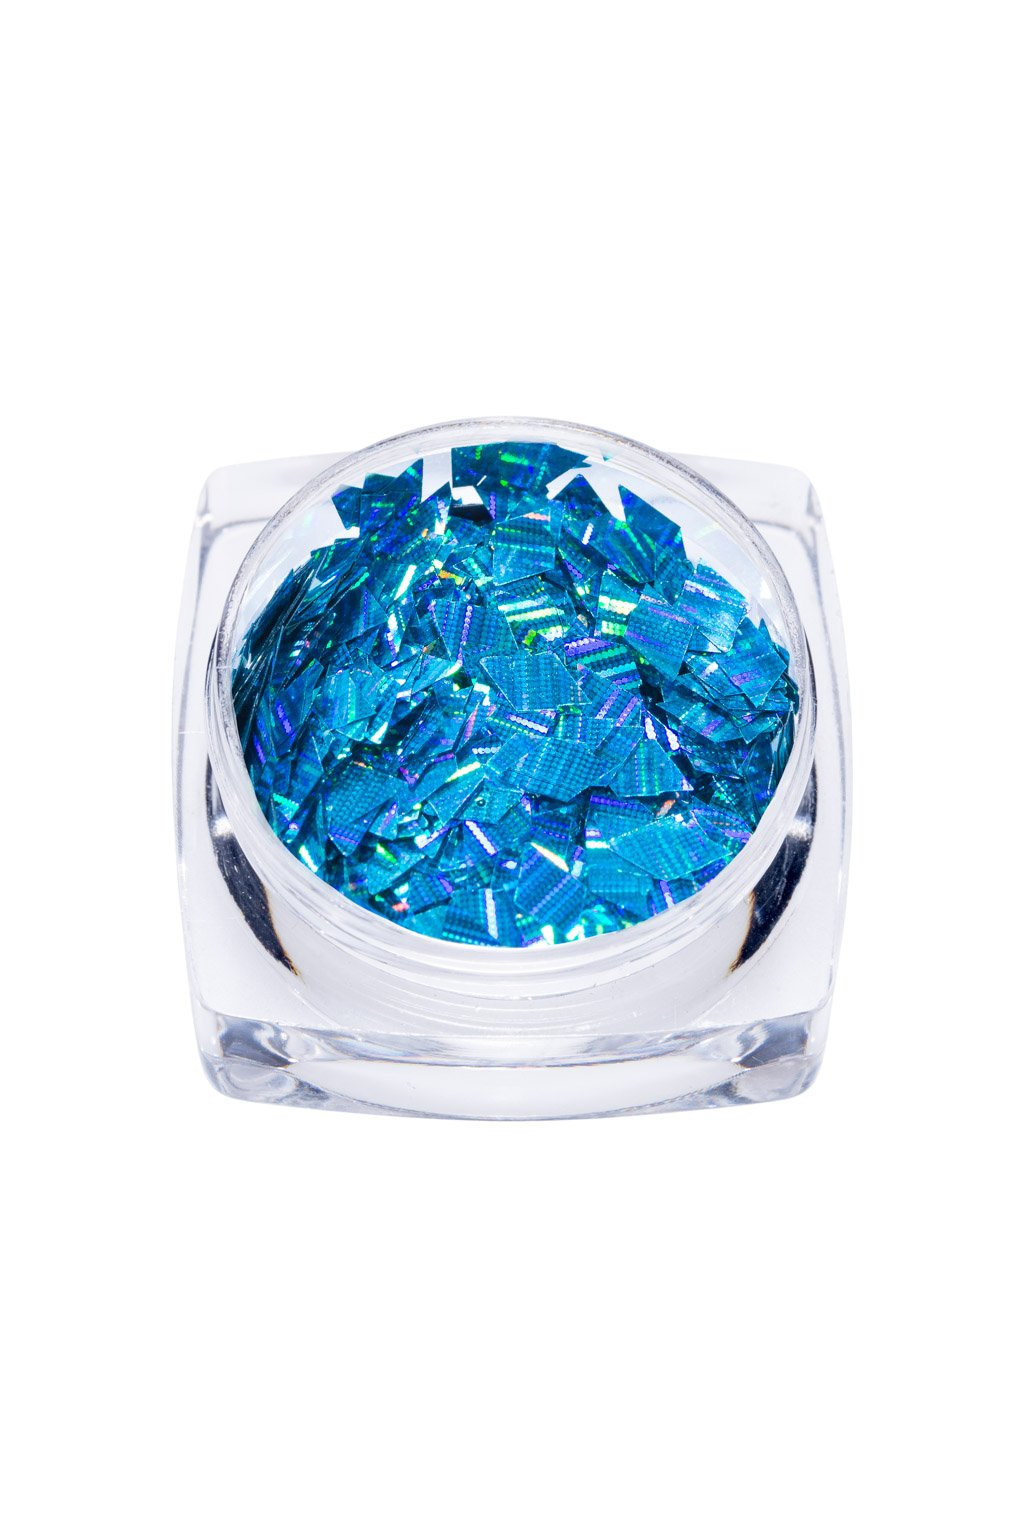 24074 blue holo diamond